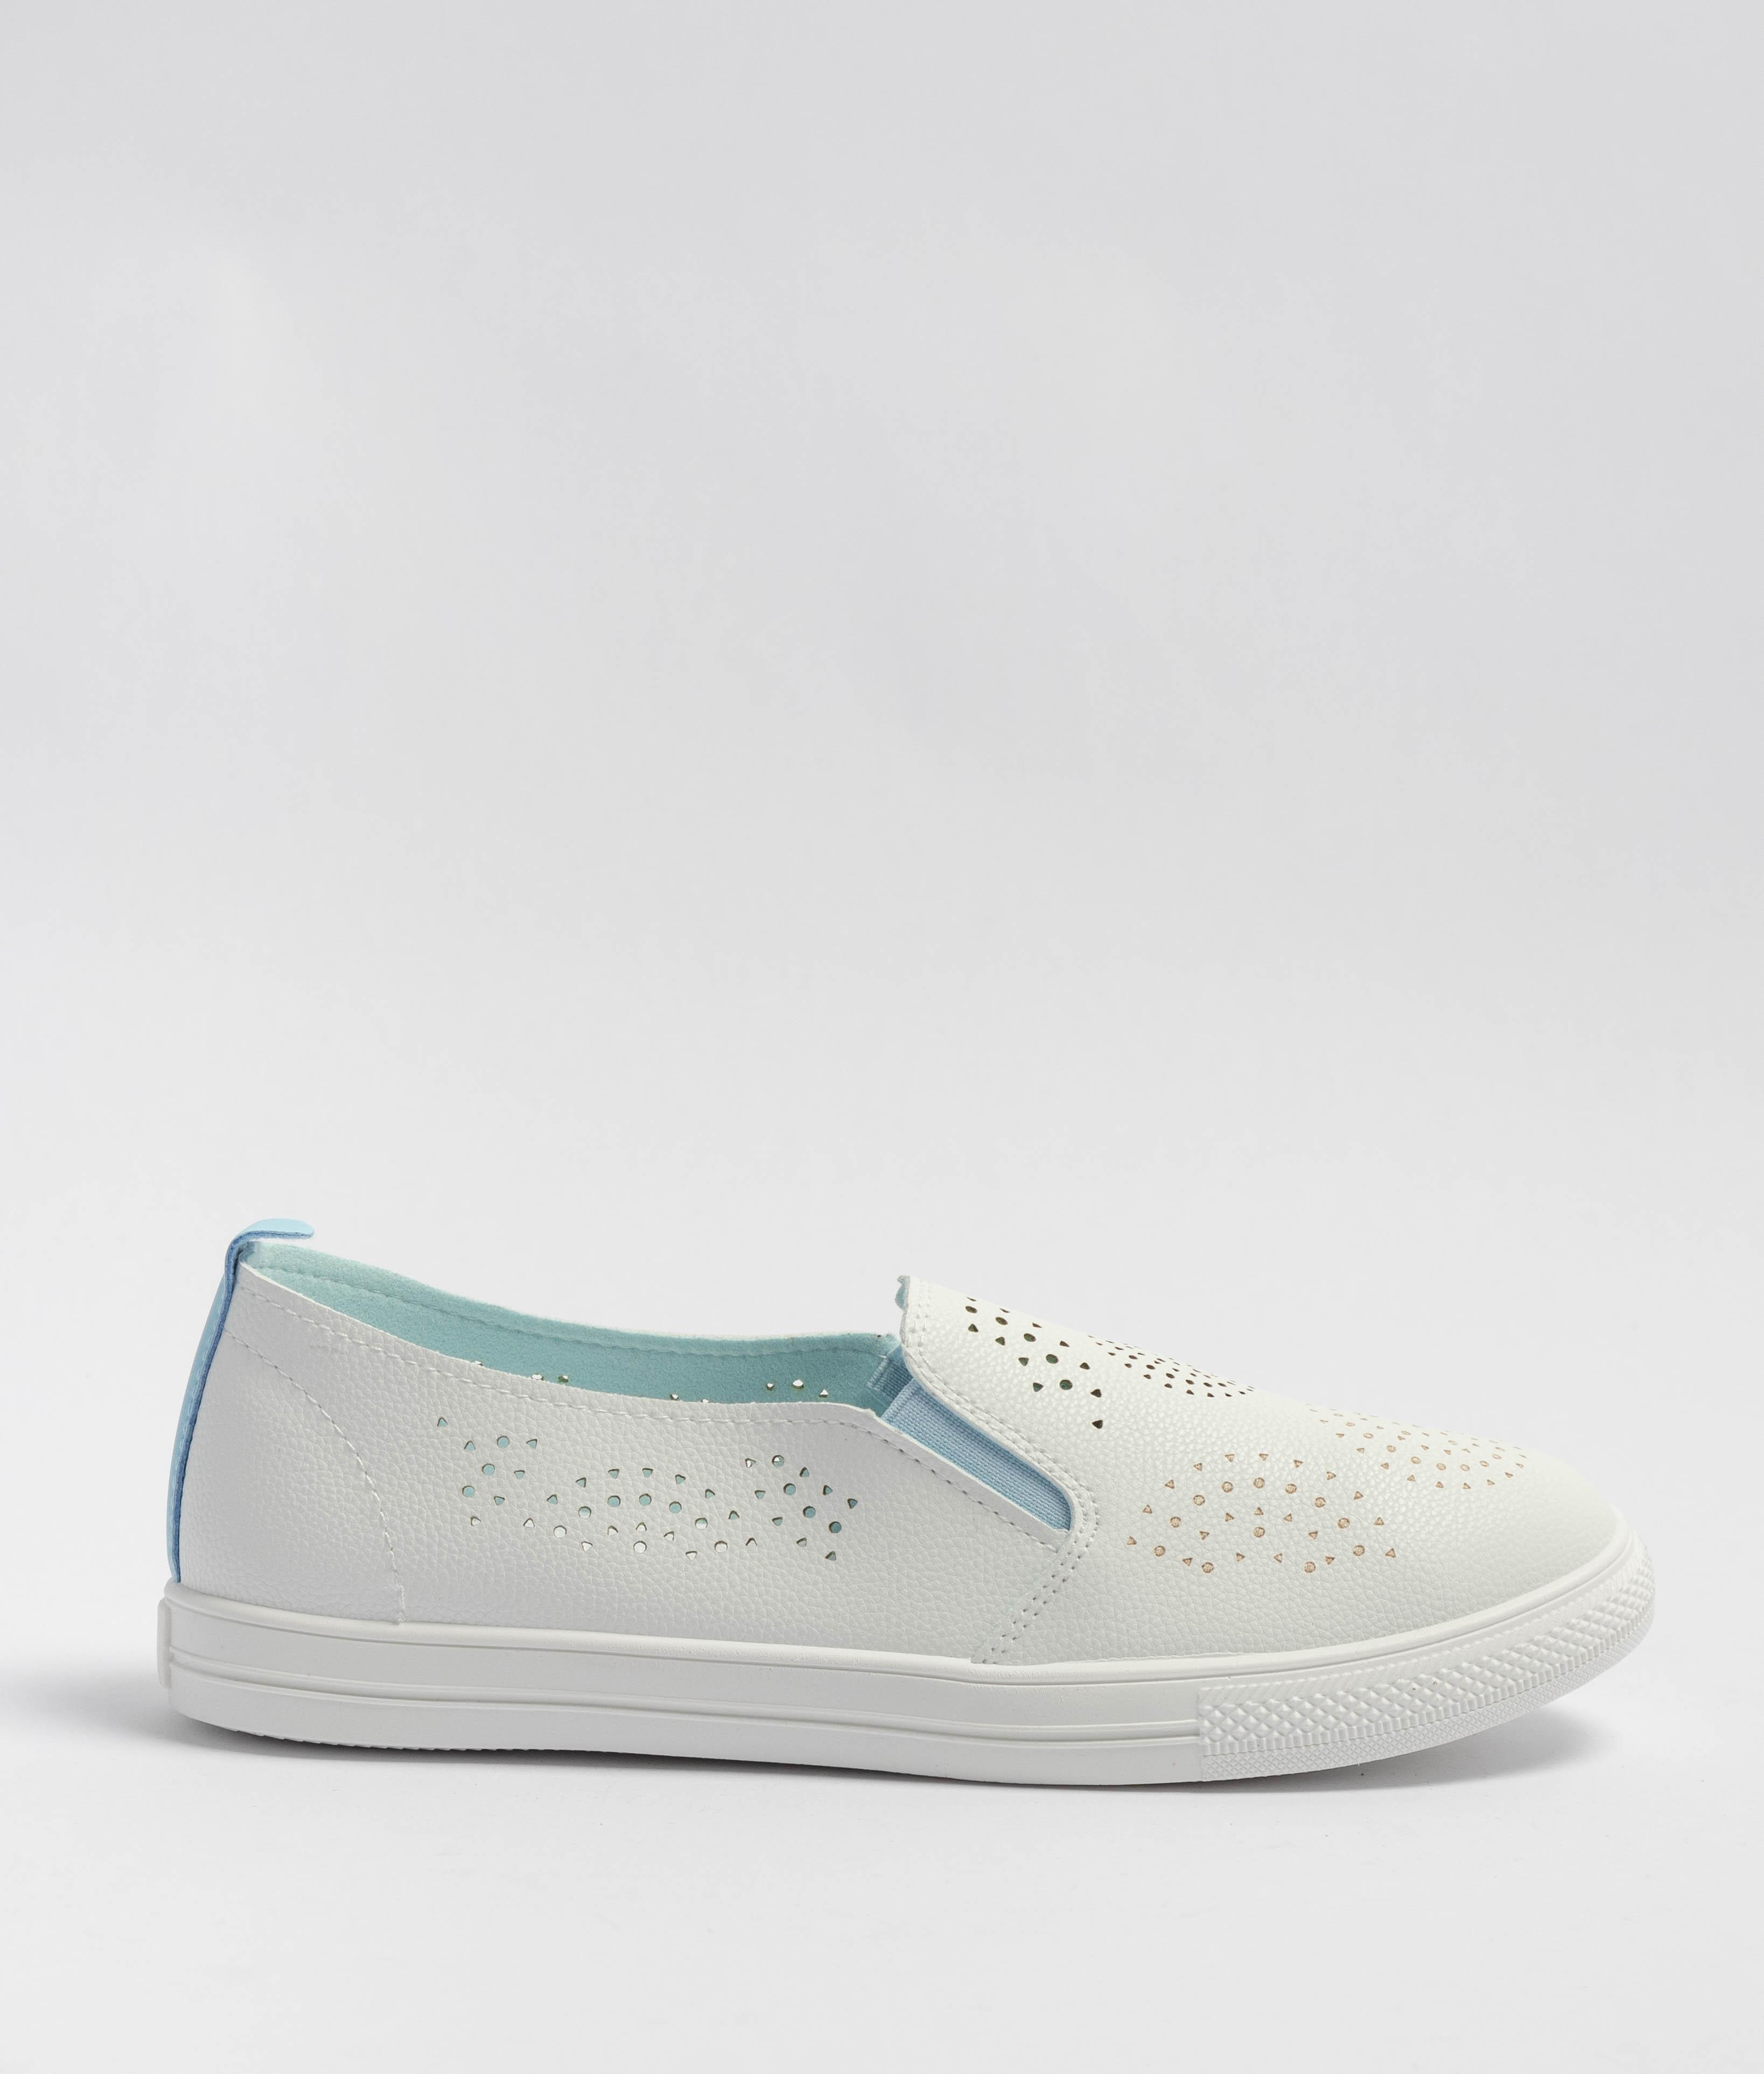 Sneakers Chery - Azul Claro